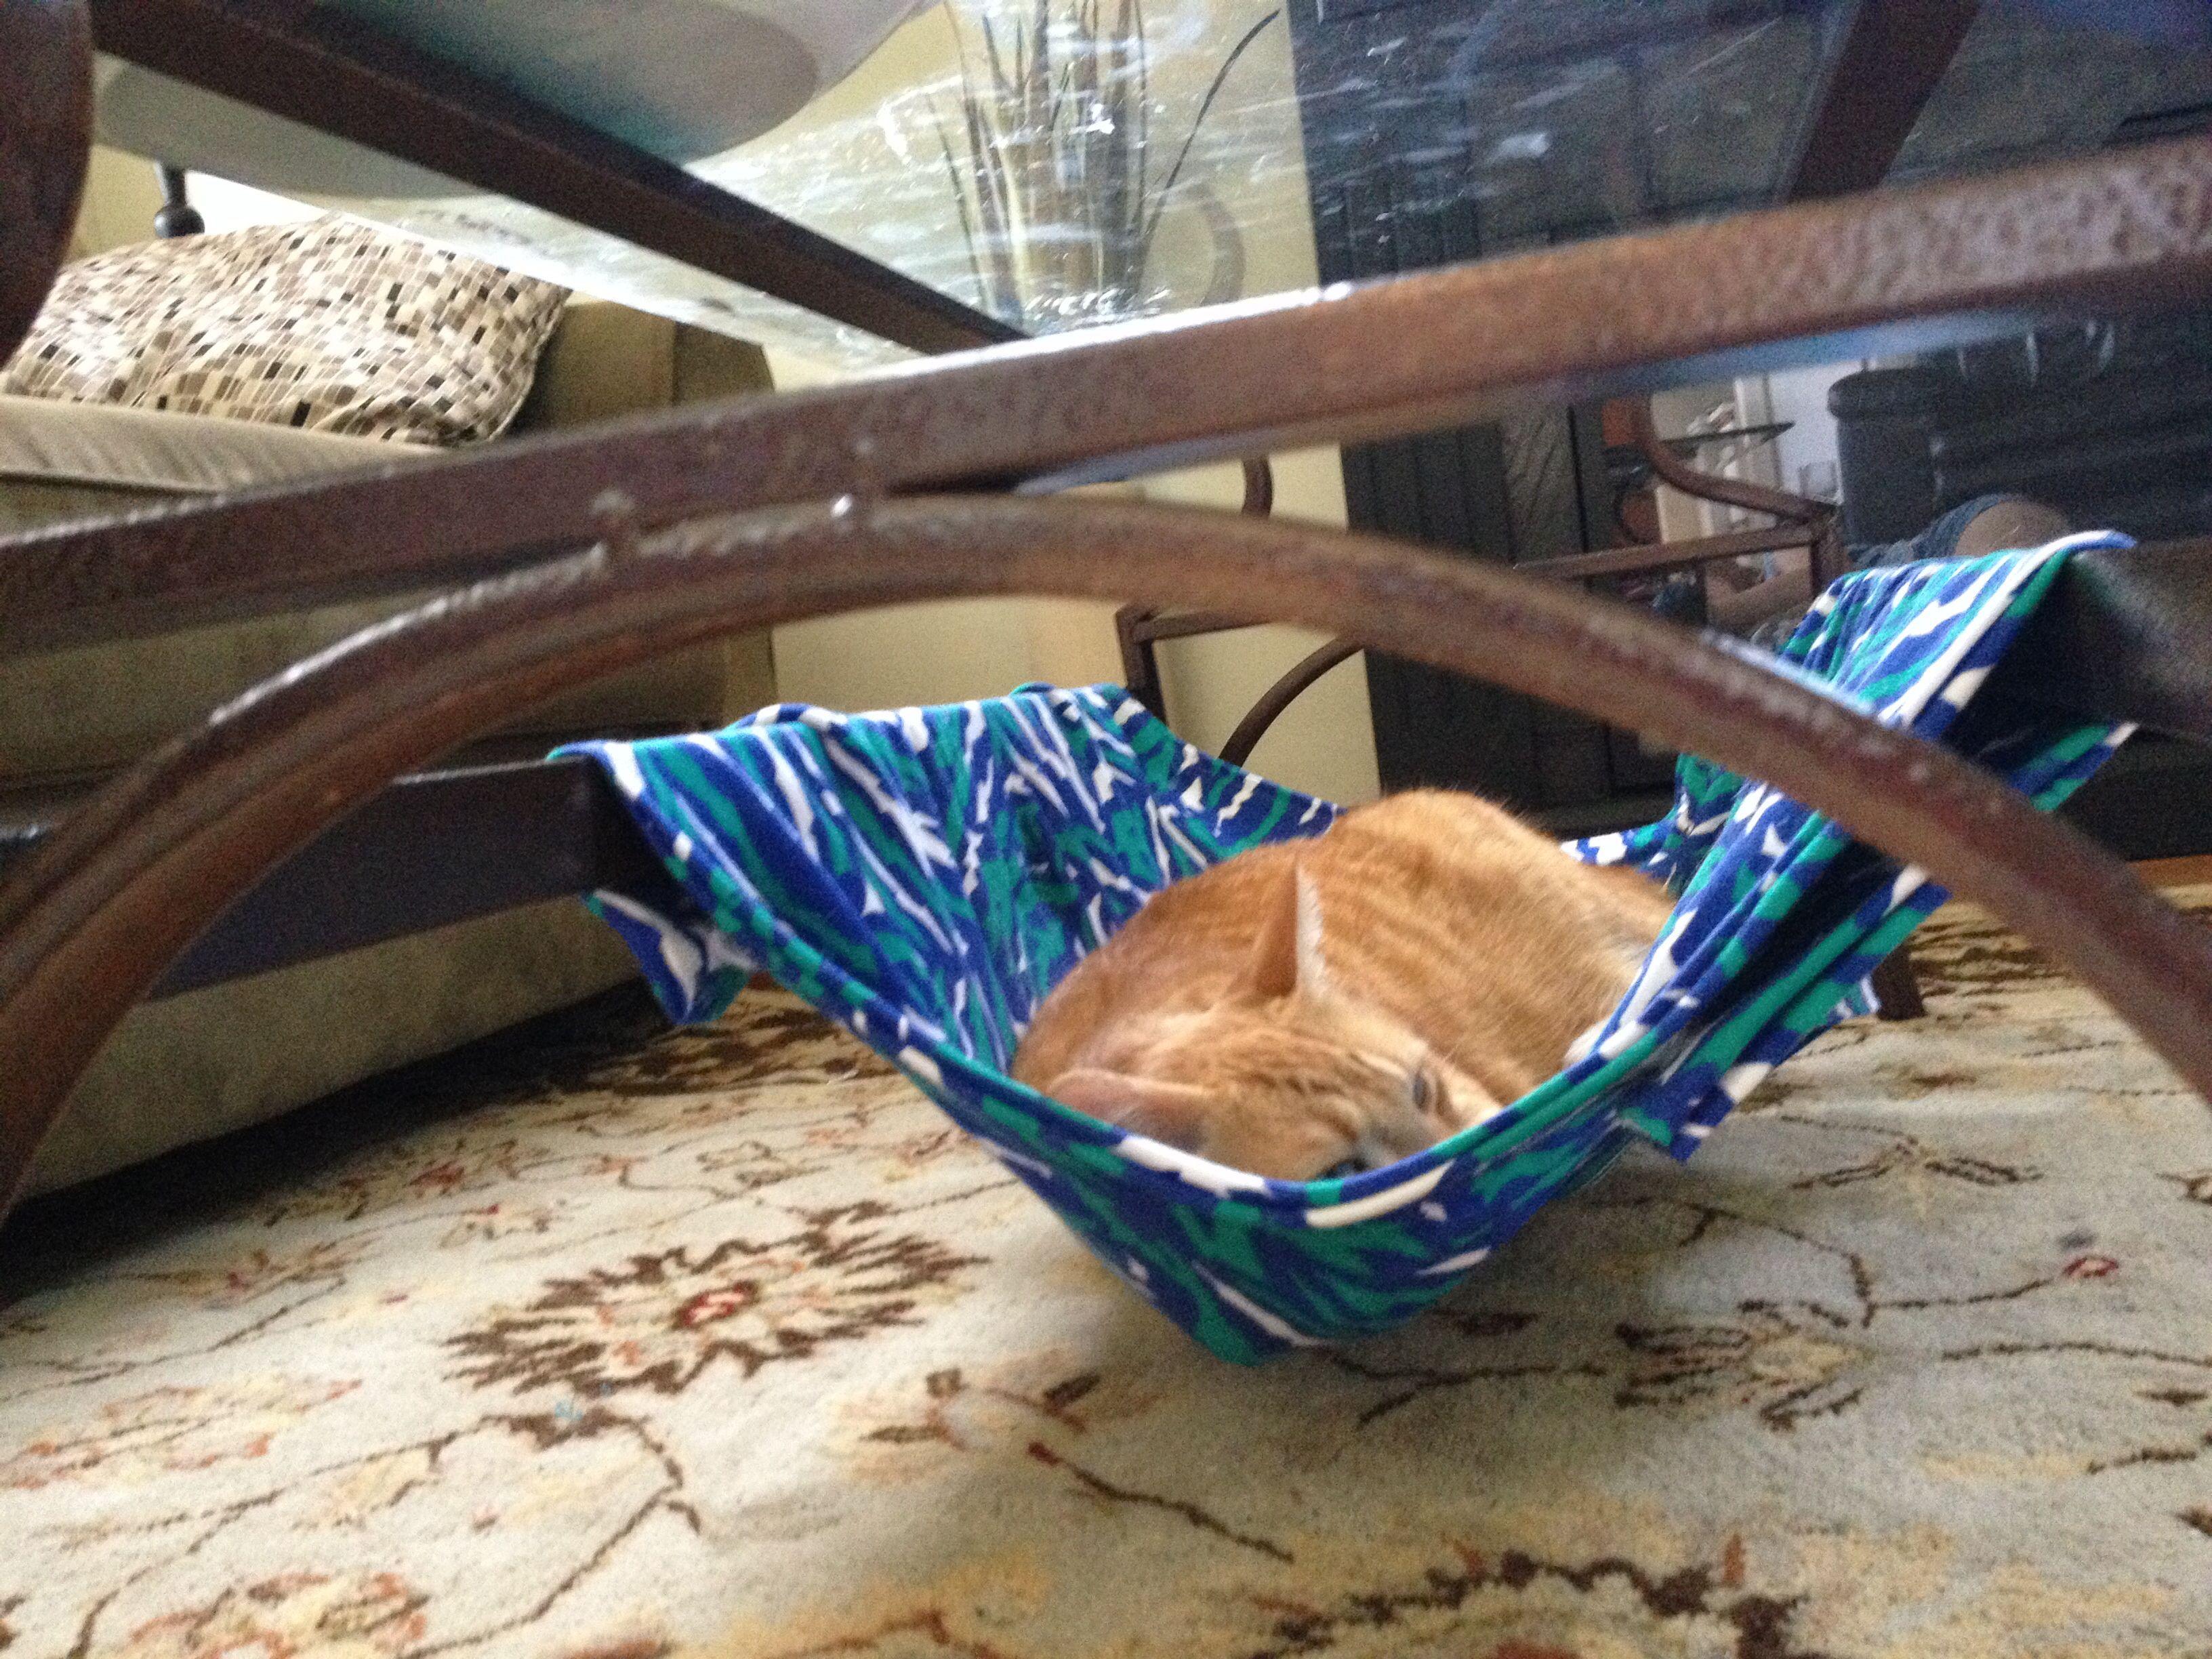 Cat hammock under my coffee table